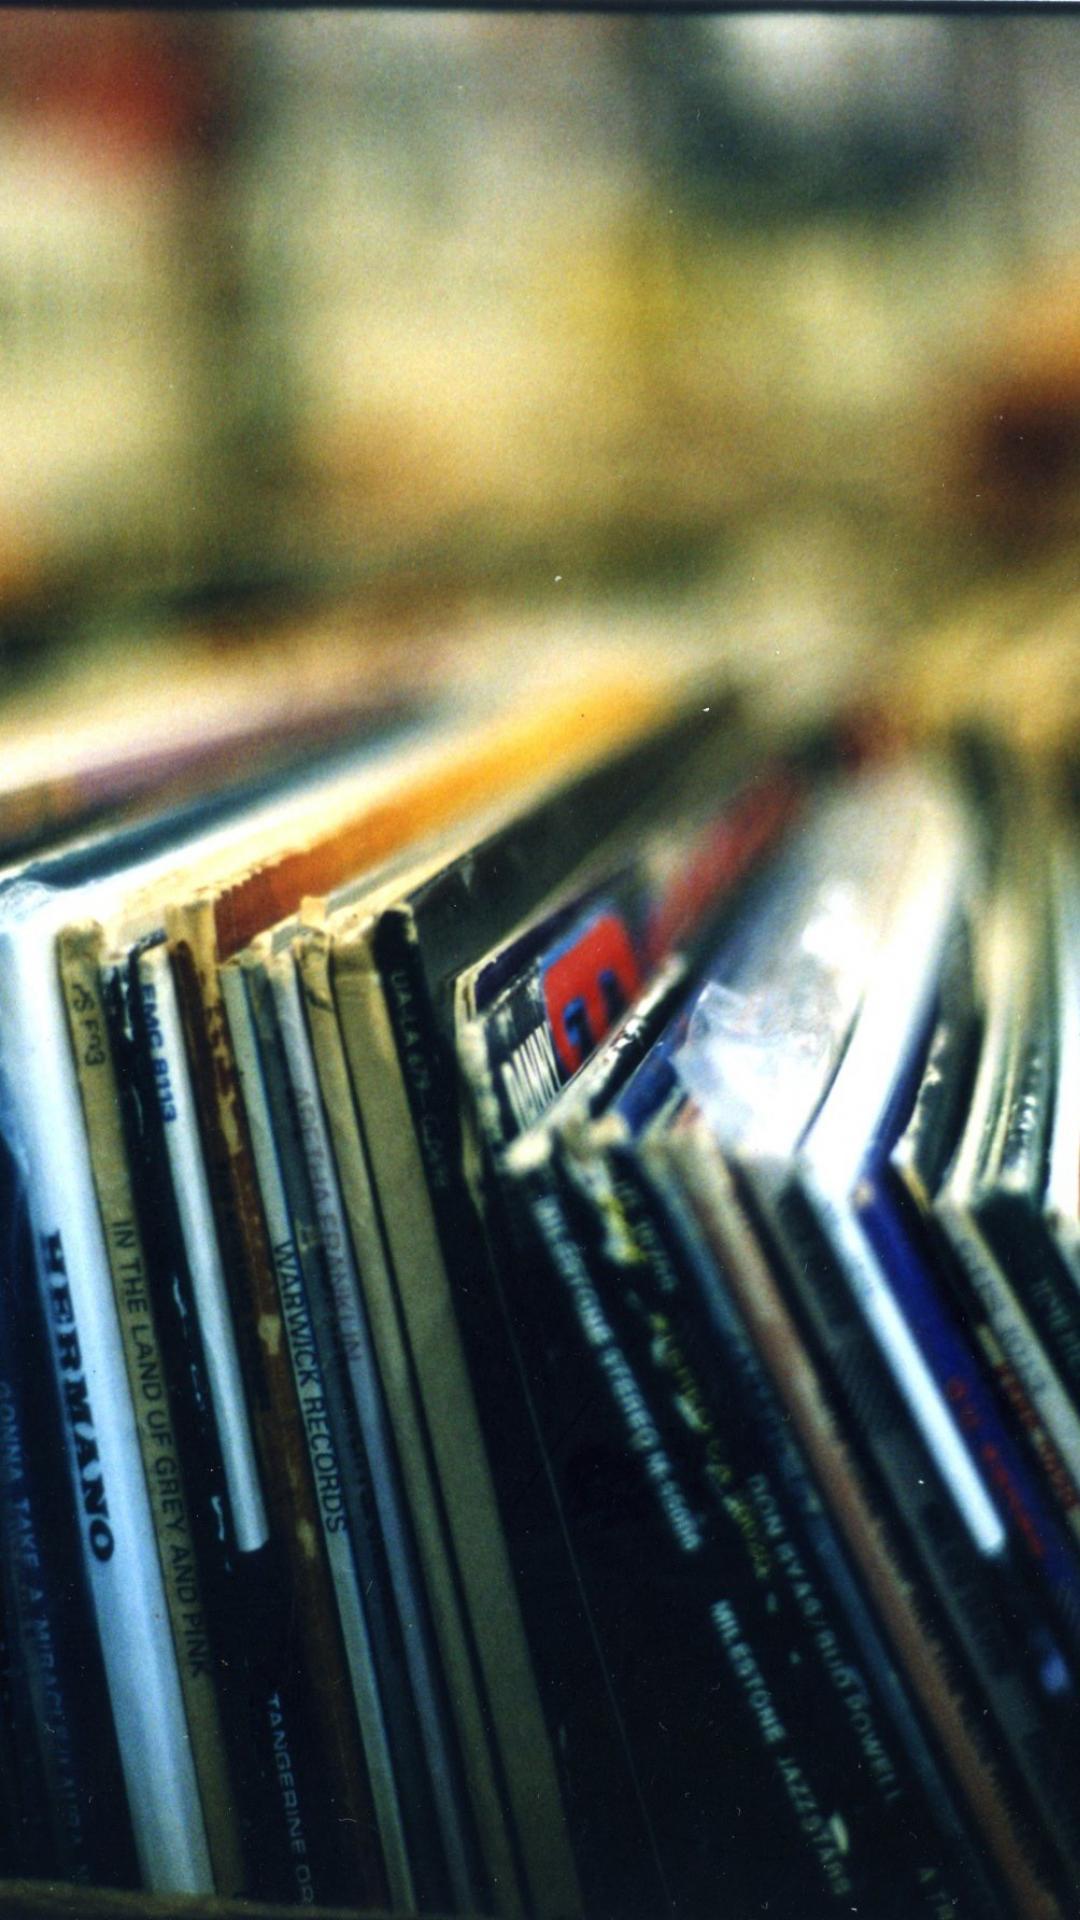 record albums 1097024 1080x1920